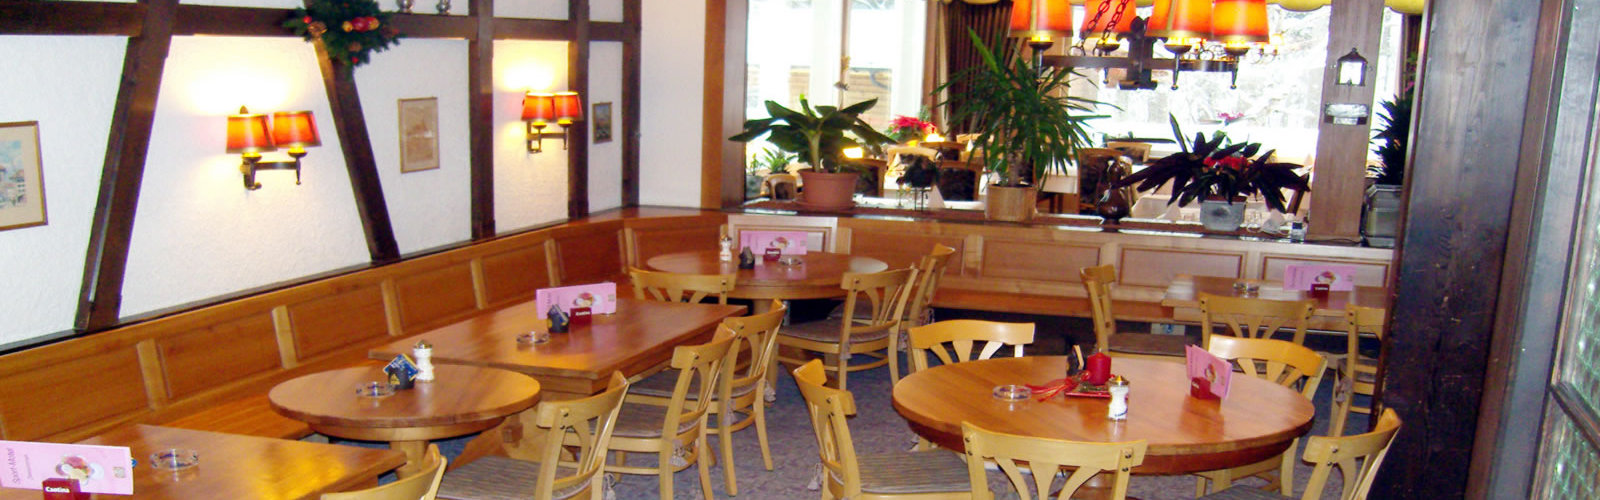 Restaurant vista resort hotel - Restaurant terrasse jardin toulouse le mans ...